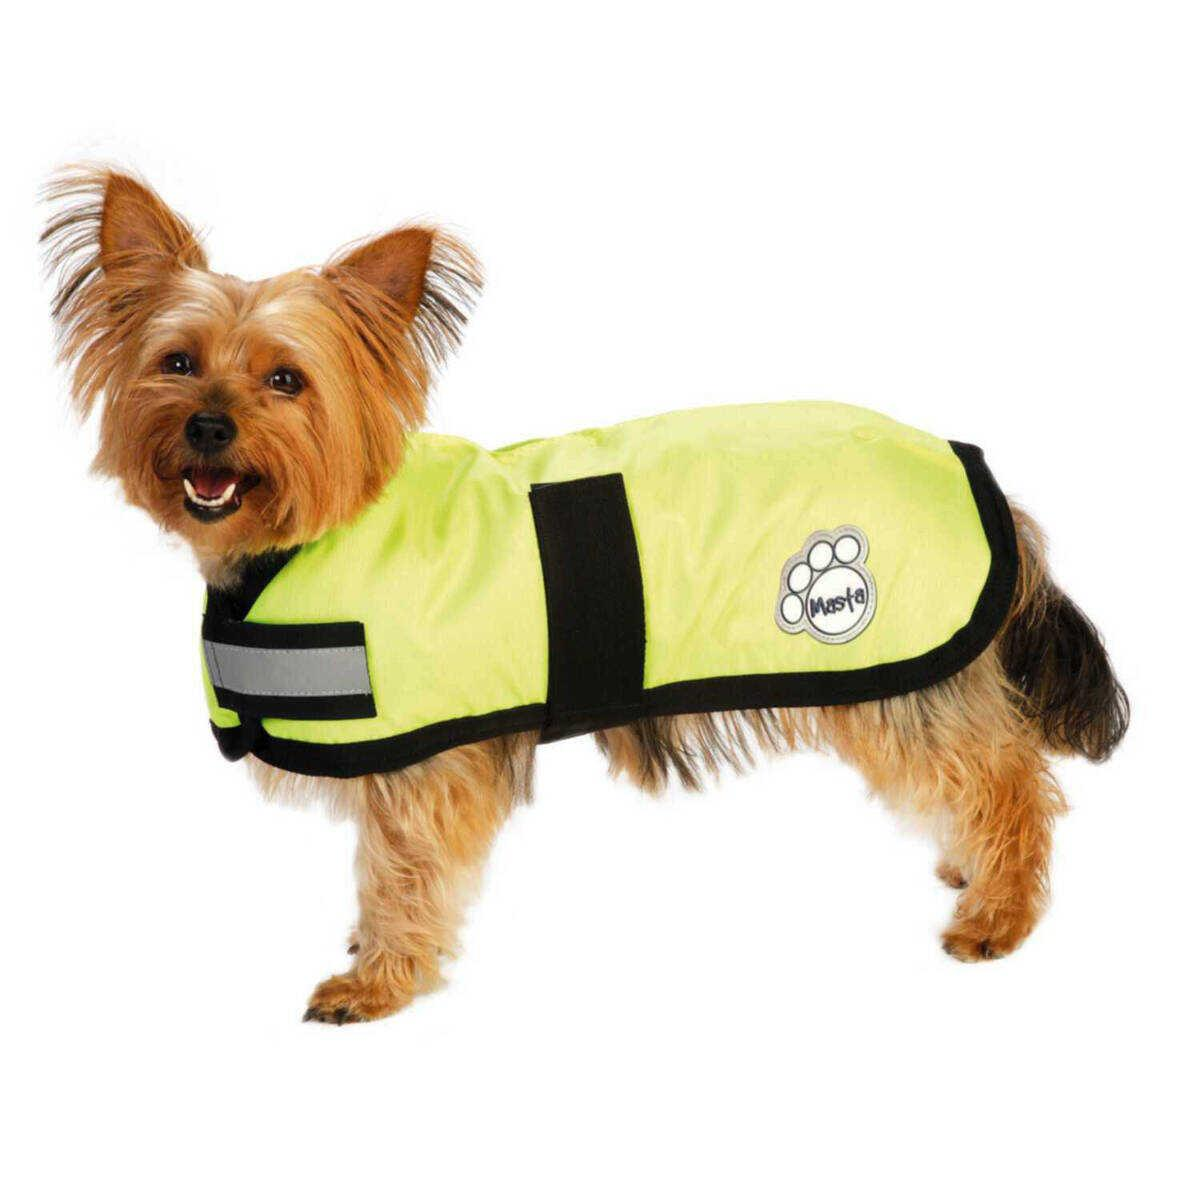 WoofMasta Waterproof Dog Coat